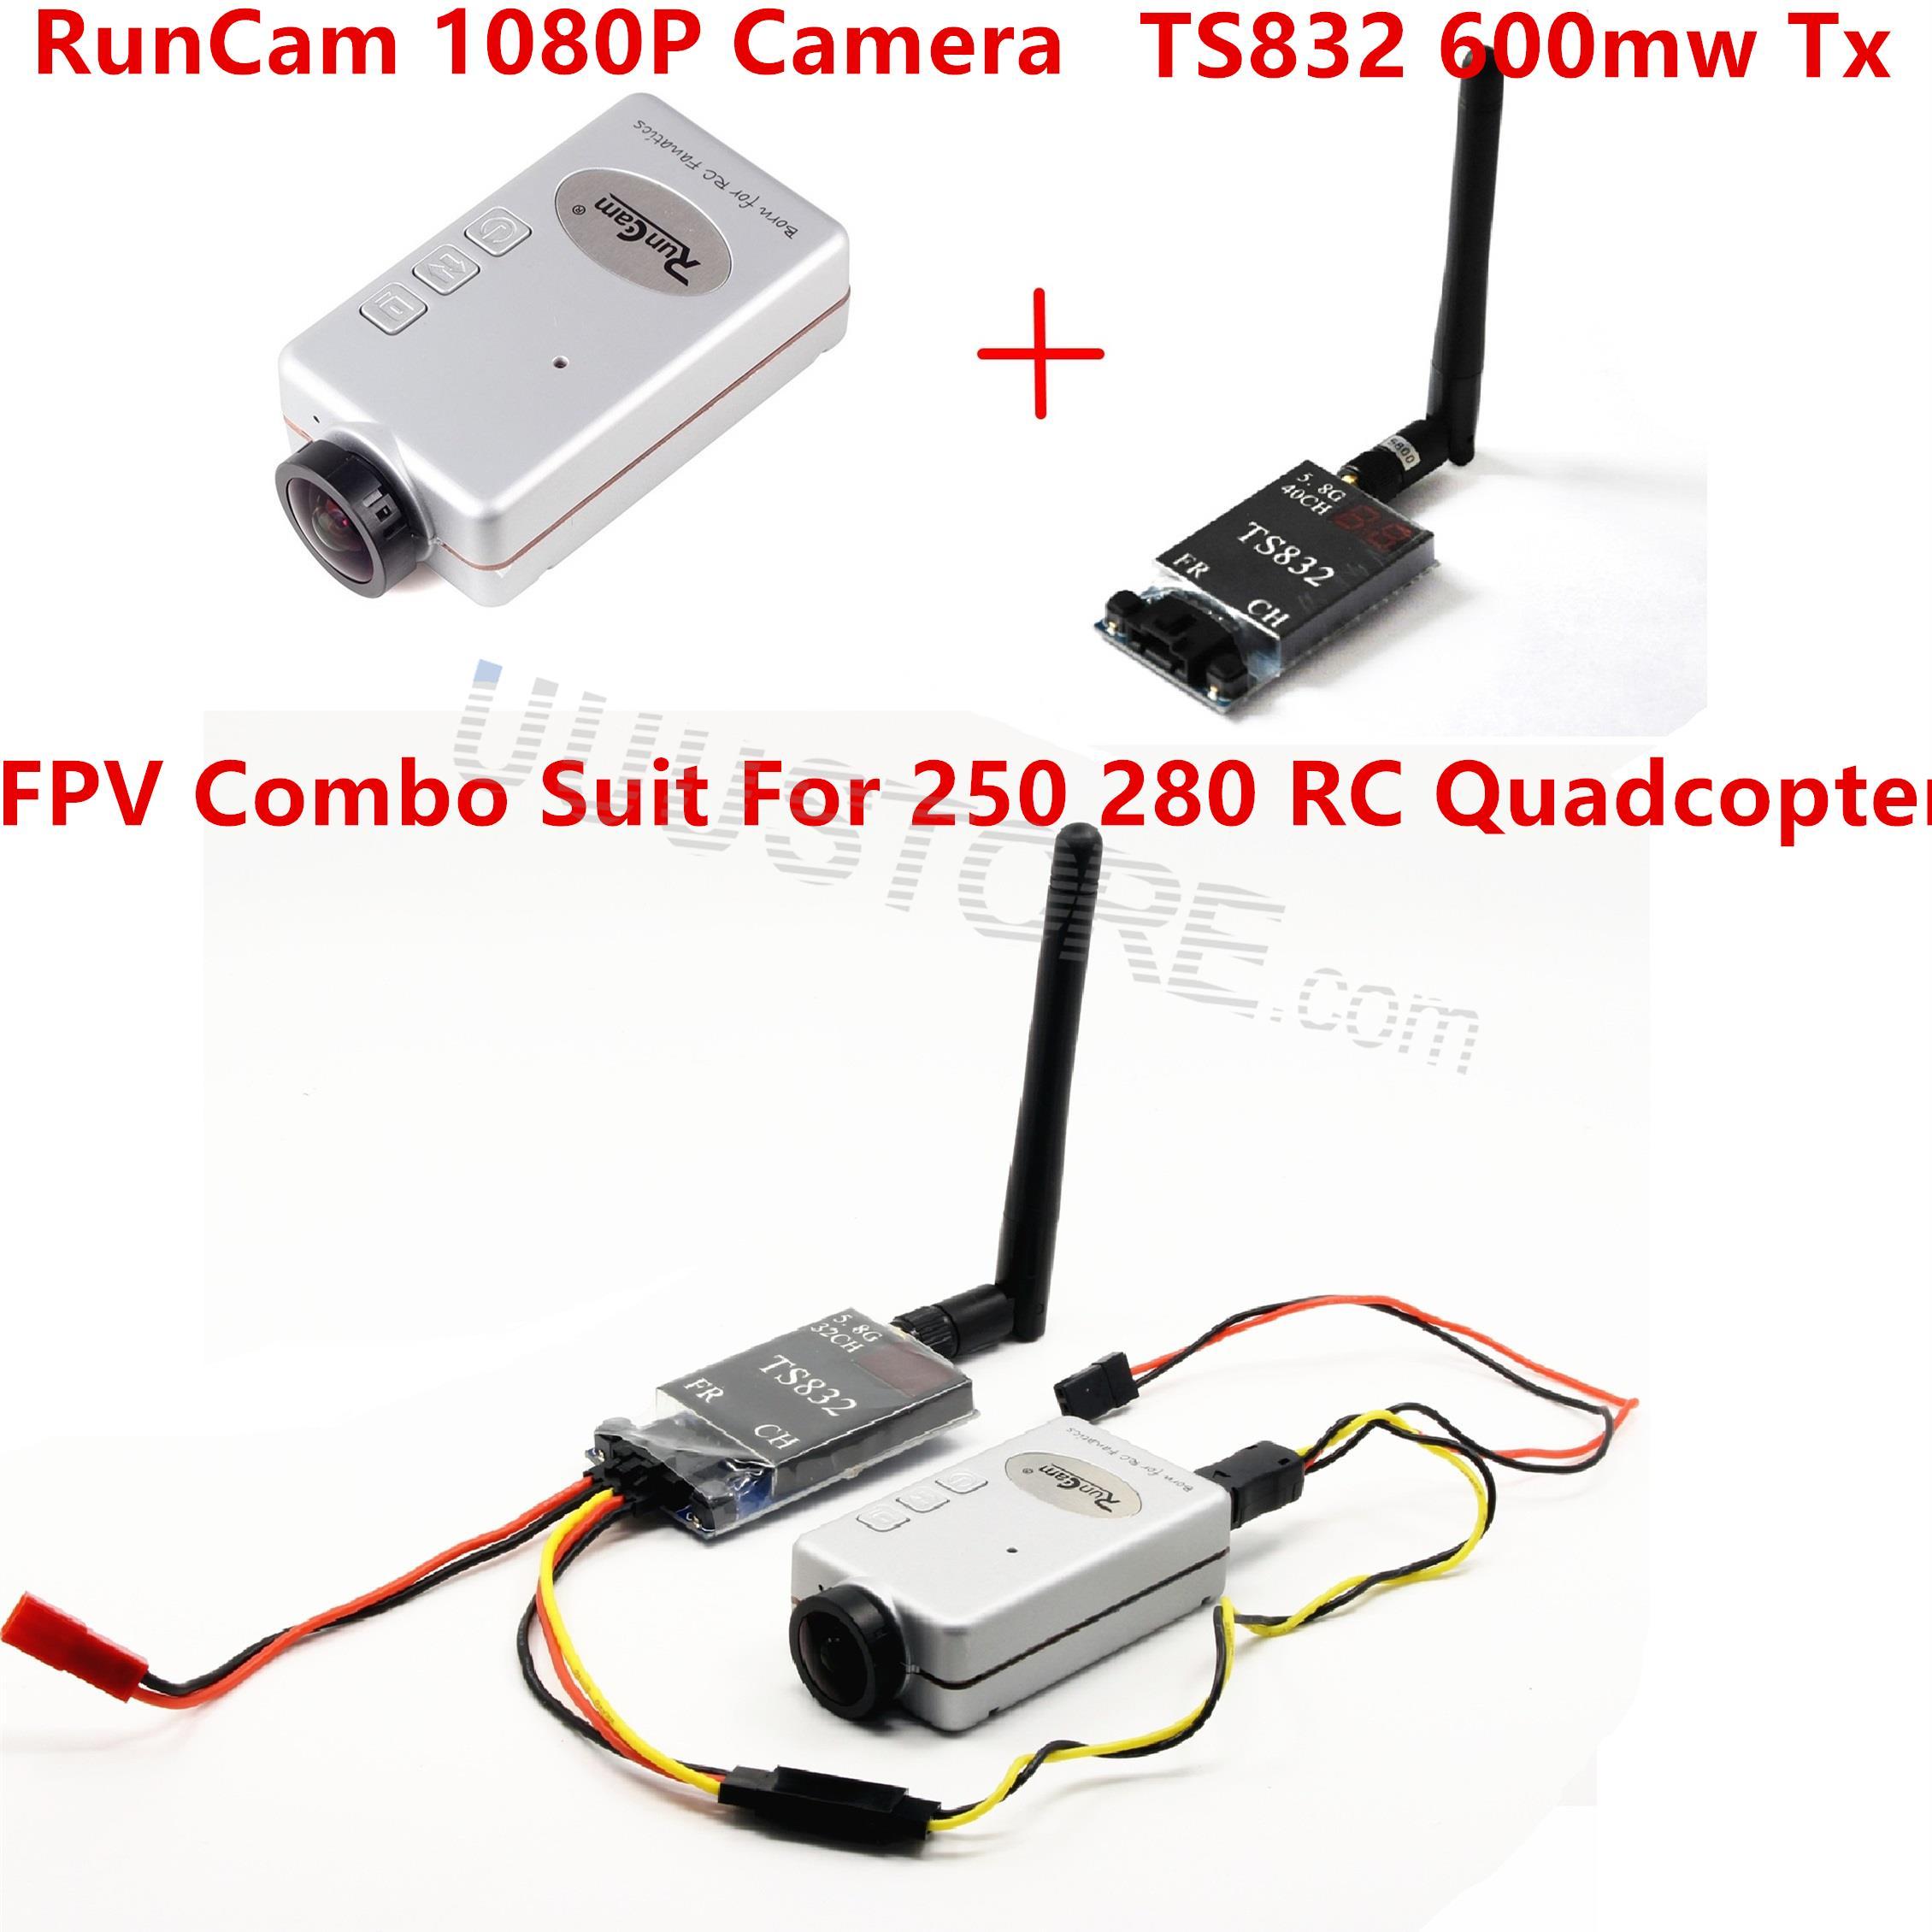 Mini FPV Combo with DVR RunCam 1080P TS832 Video Transmitter For Racing Drone QAV250 RC Quadcopter